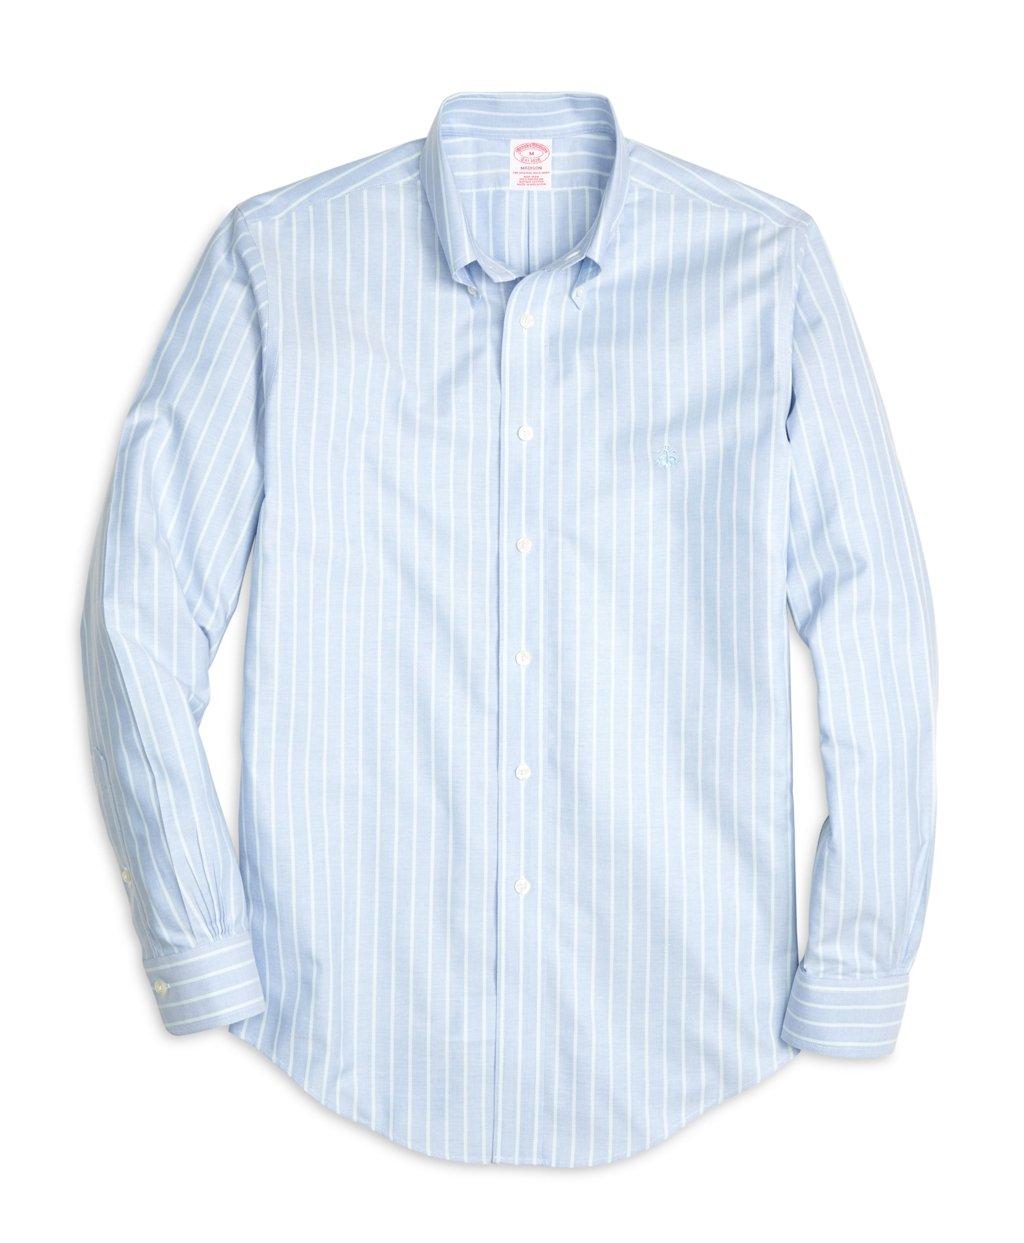 Brooks brothers non iron madison fit stripe sport shirt in for Brooks brothers non iron shirts review